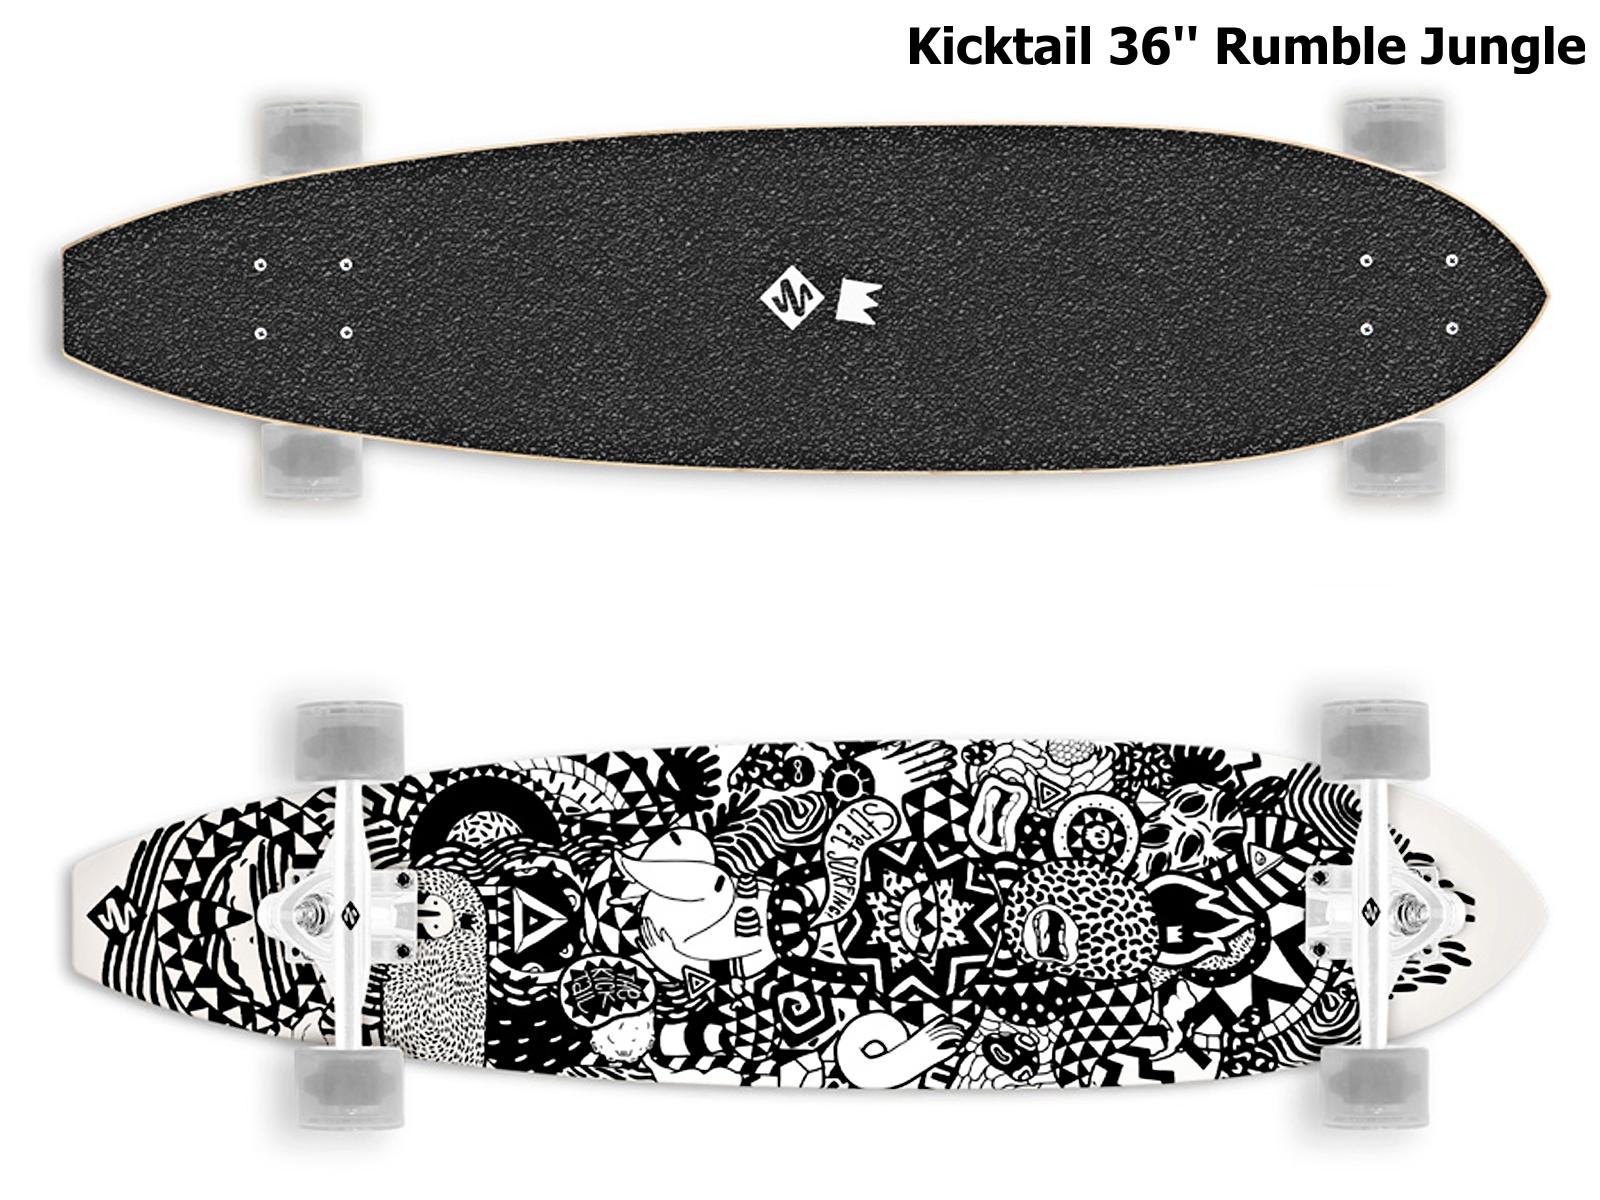 Longboard STREET SURFING Kicktail 36 Rumble Jungle